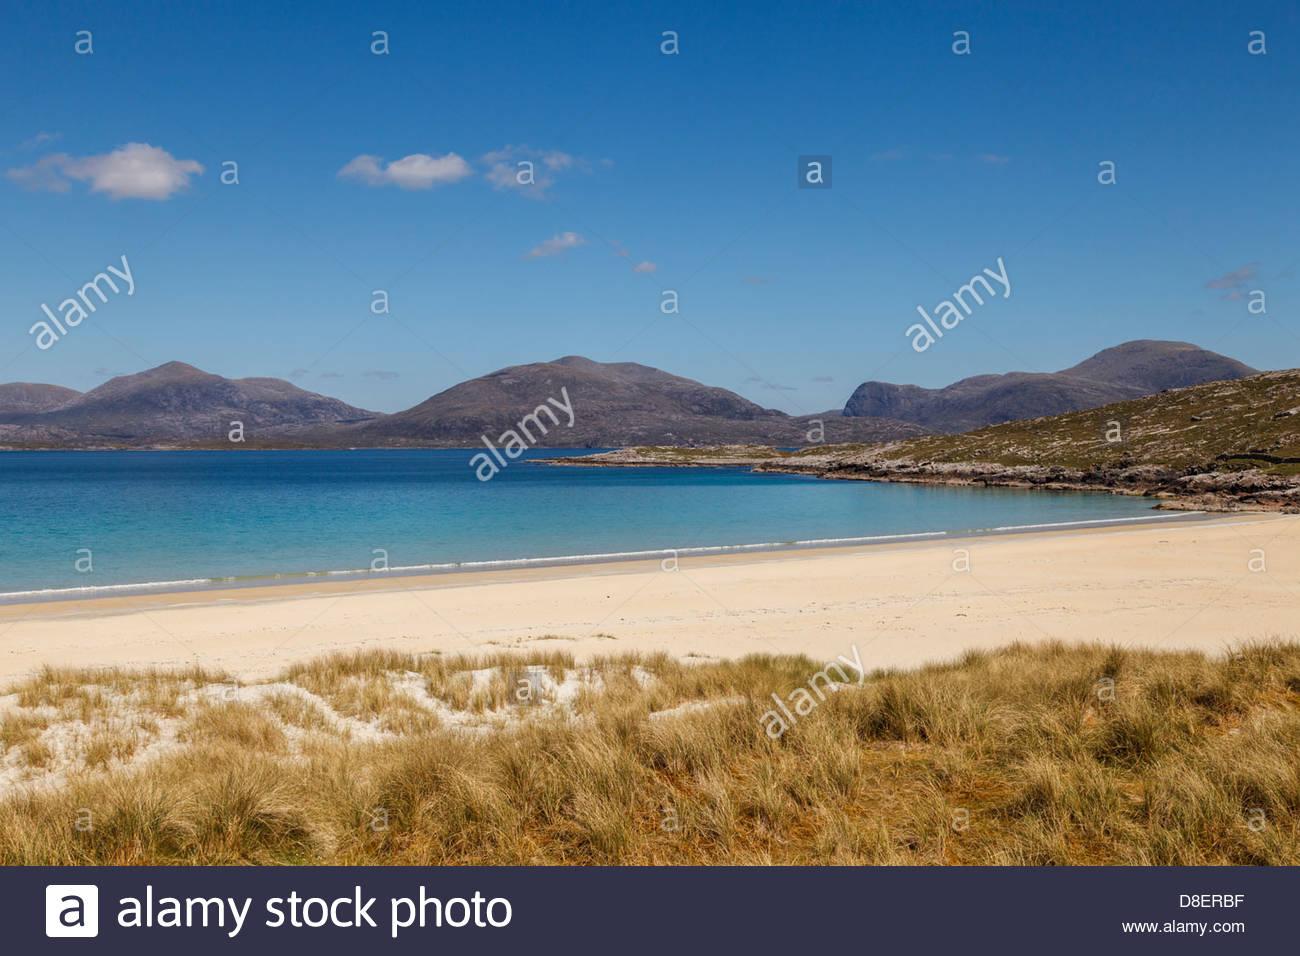 The beach at Tràigh Rosamol, West of Luskentyre, Isle of Harris, Outer Hebrides, Scotland, United Kingdom - Stock Image